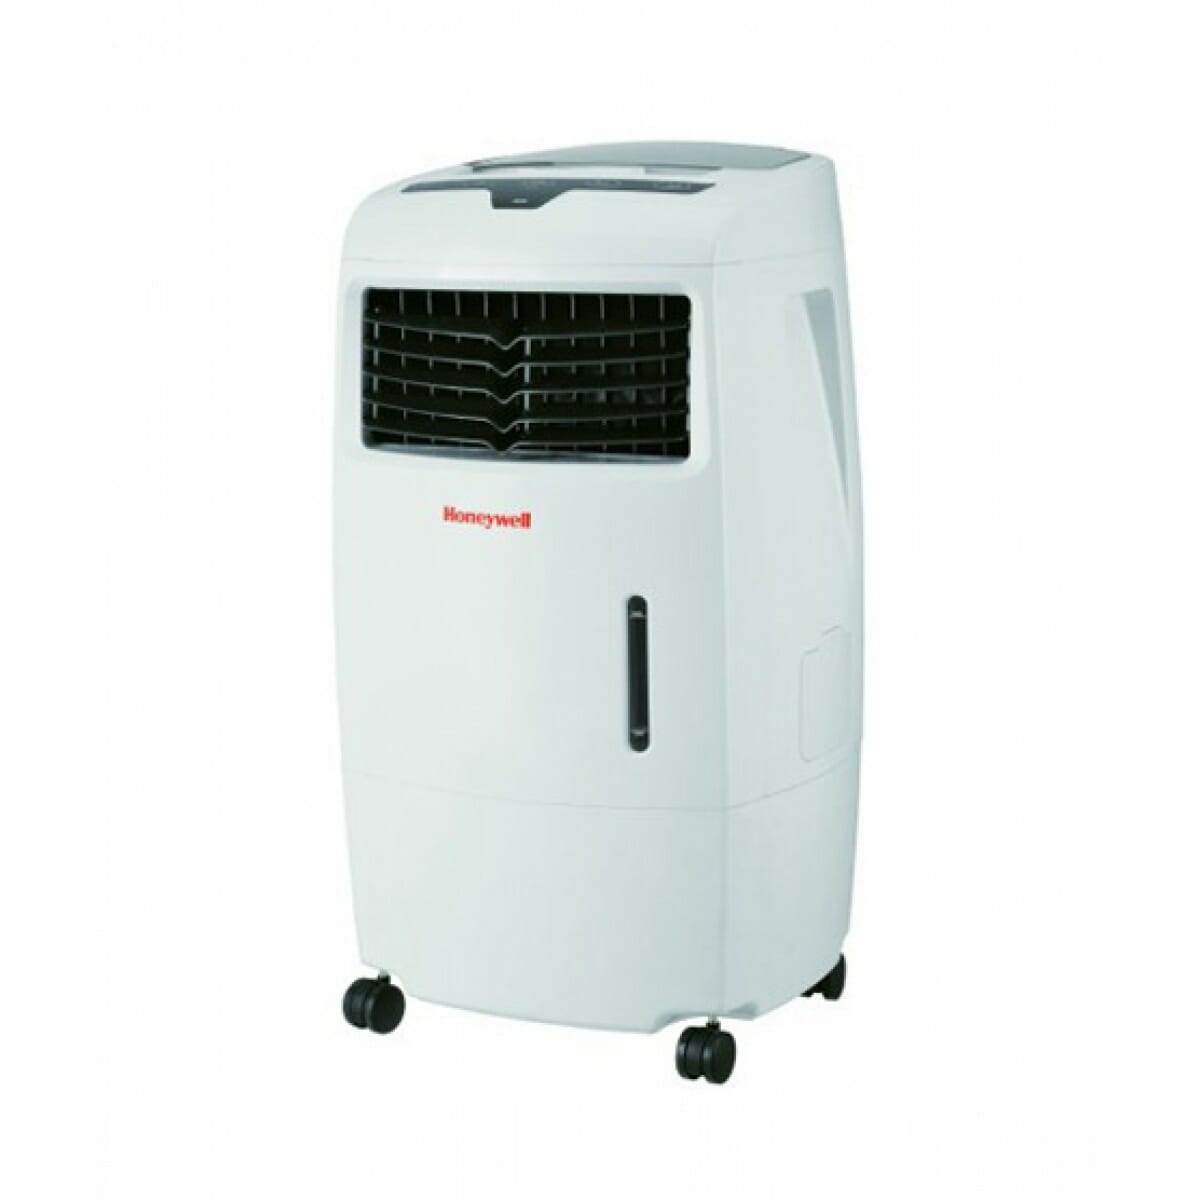 Honeywell Air Coolers - Best Cooler In Pakistan